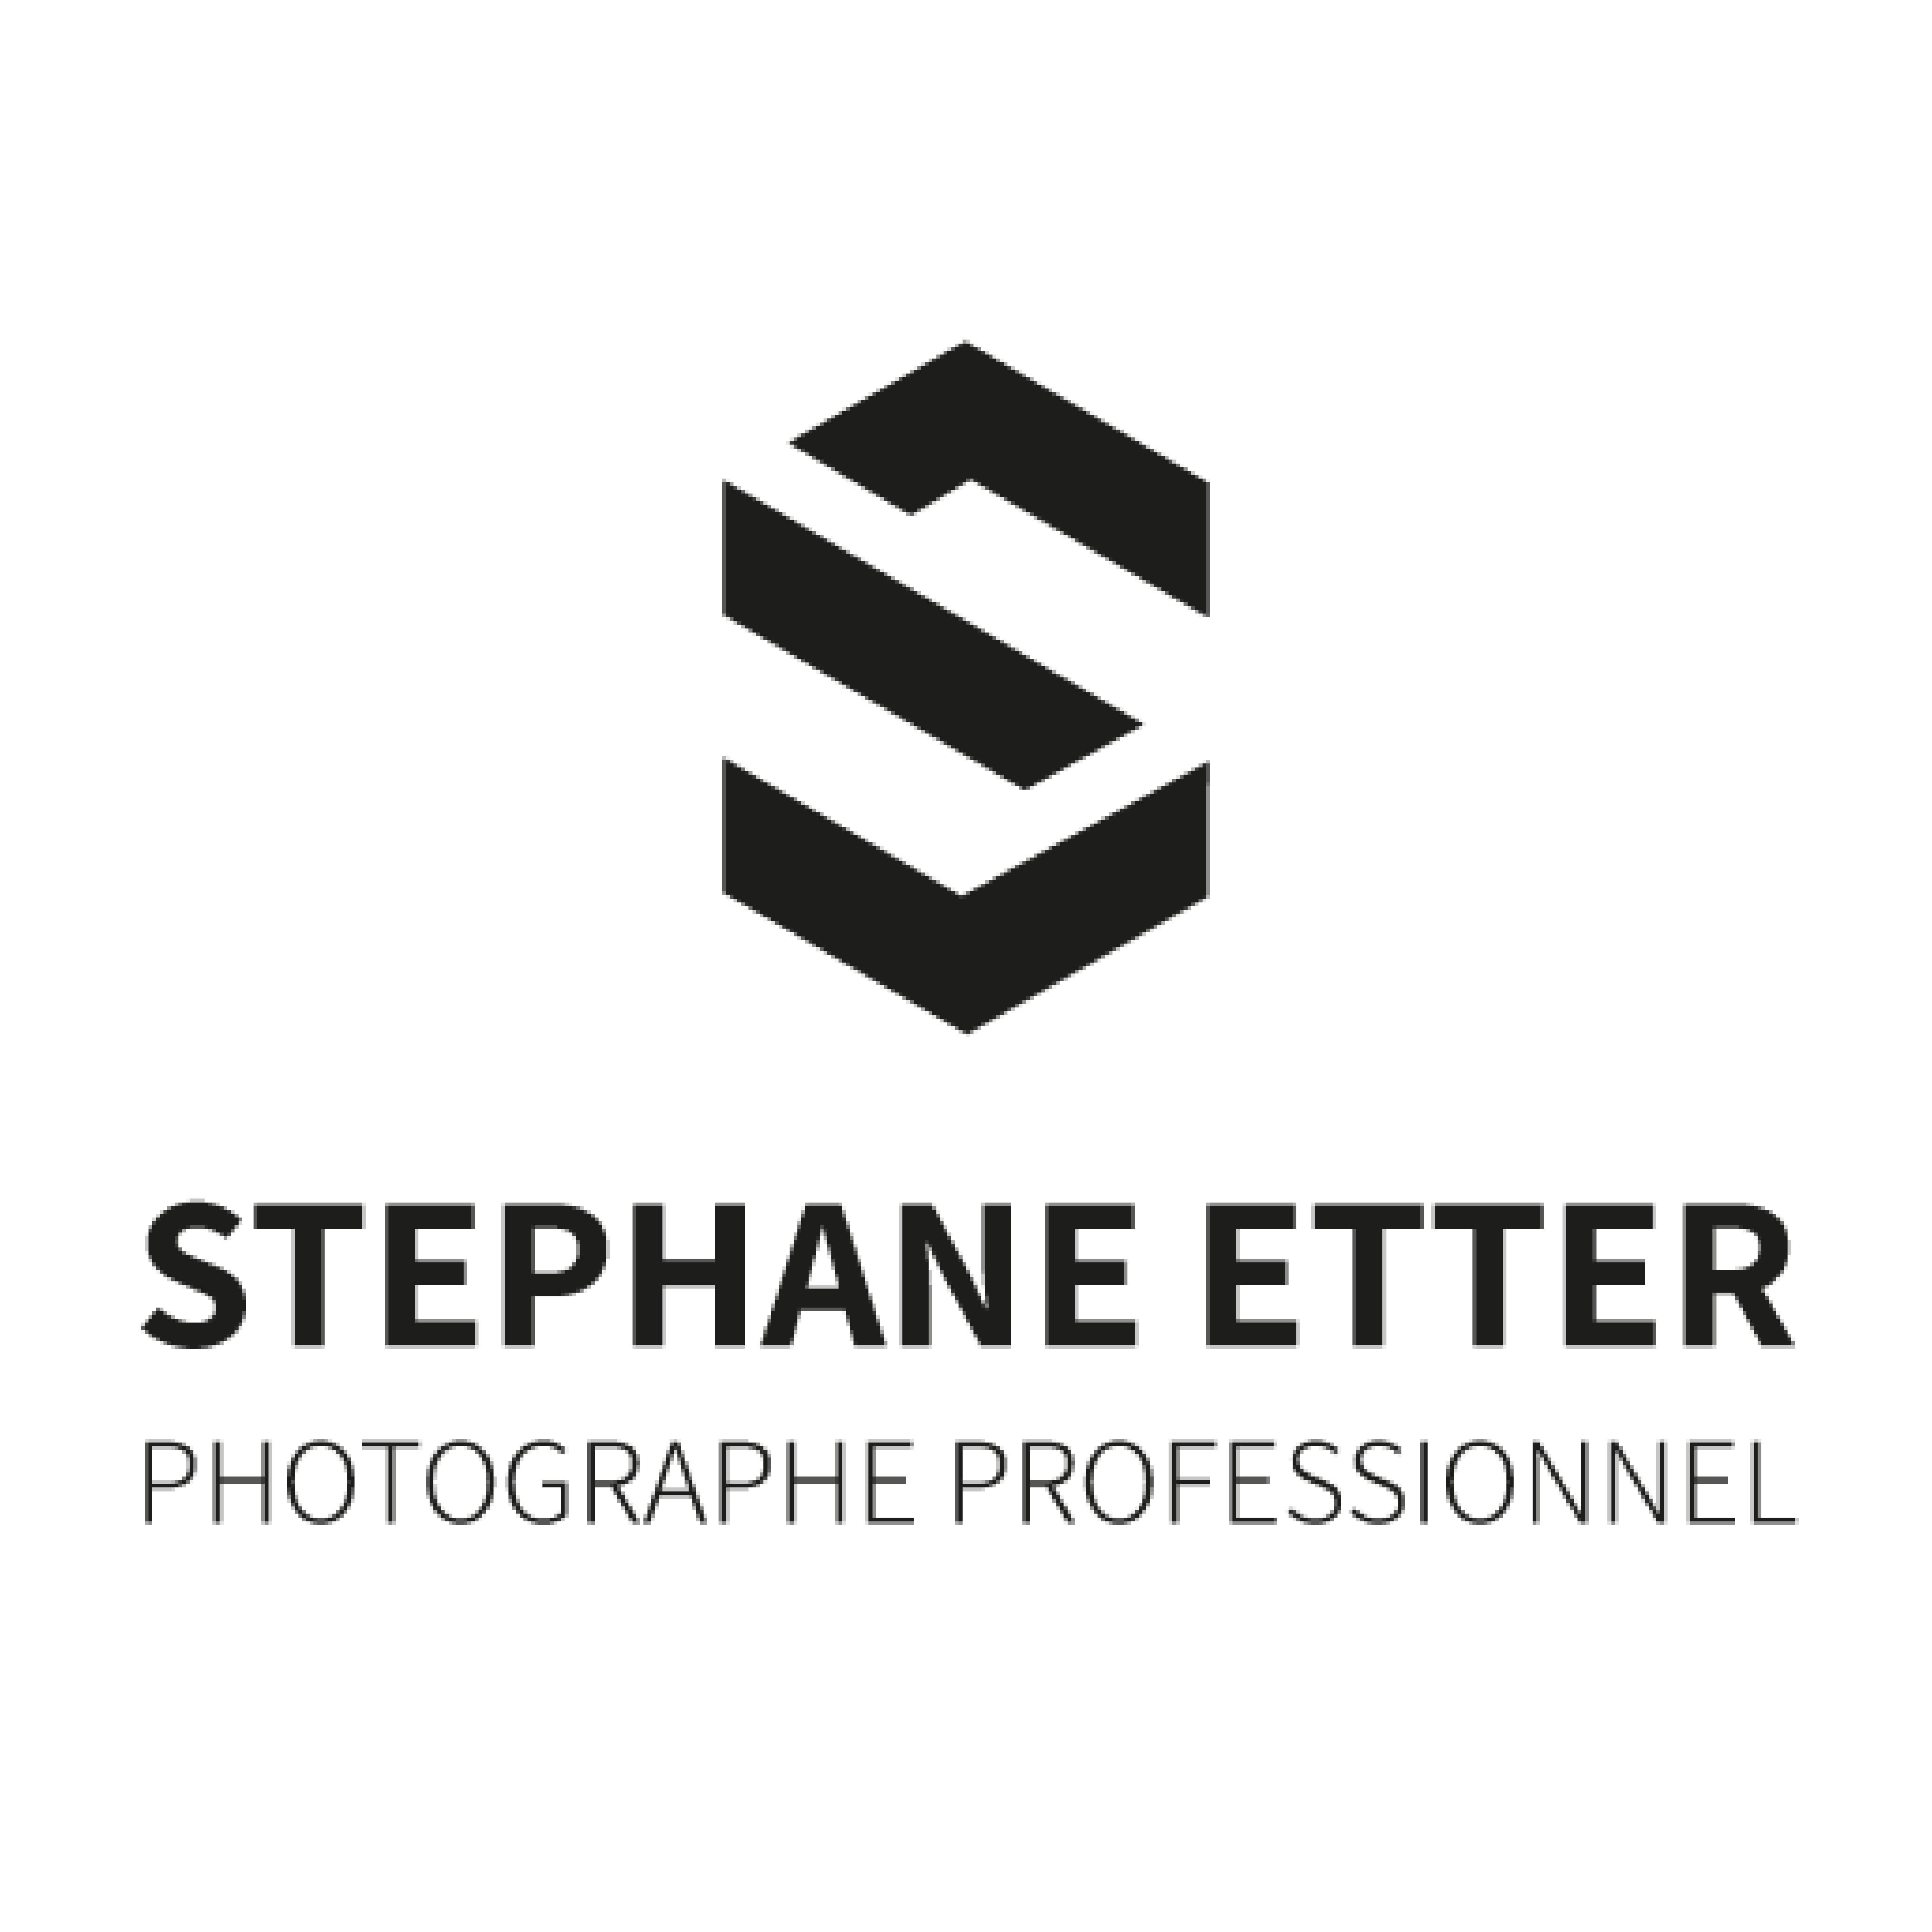 stephaneetter-01